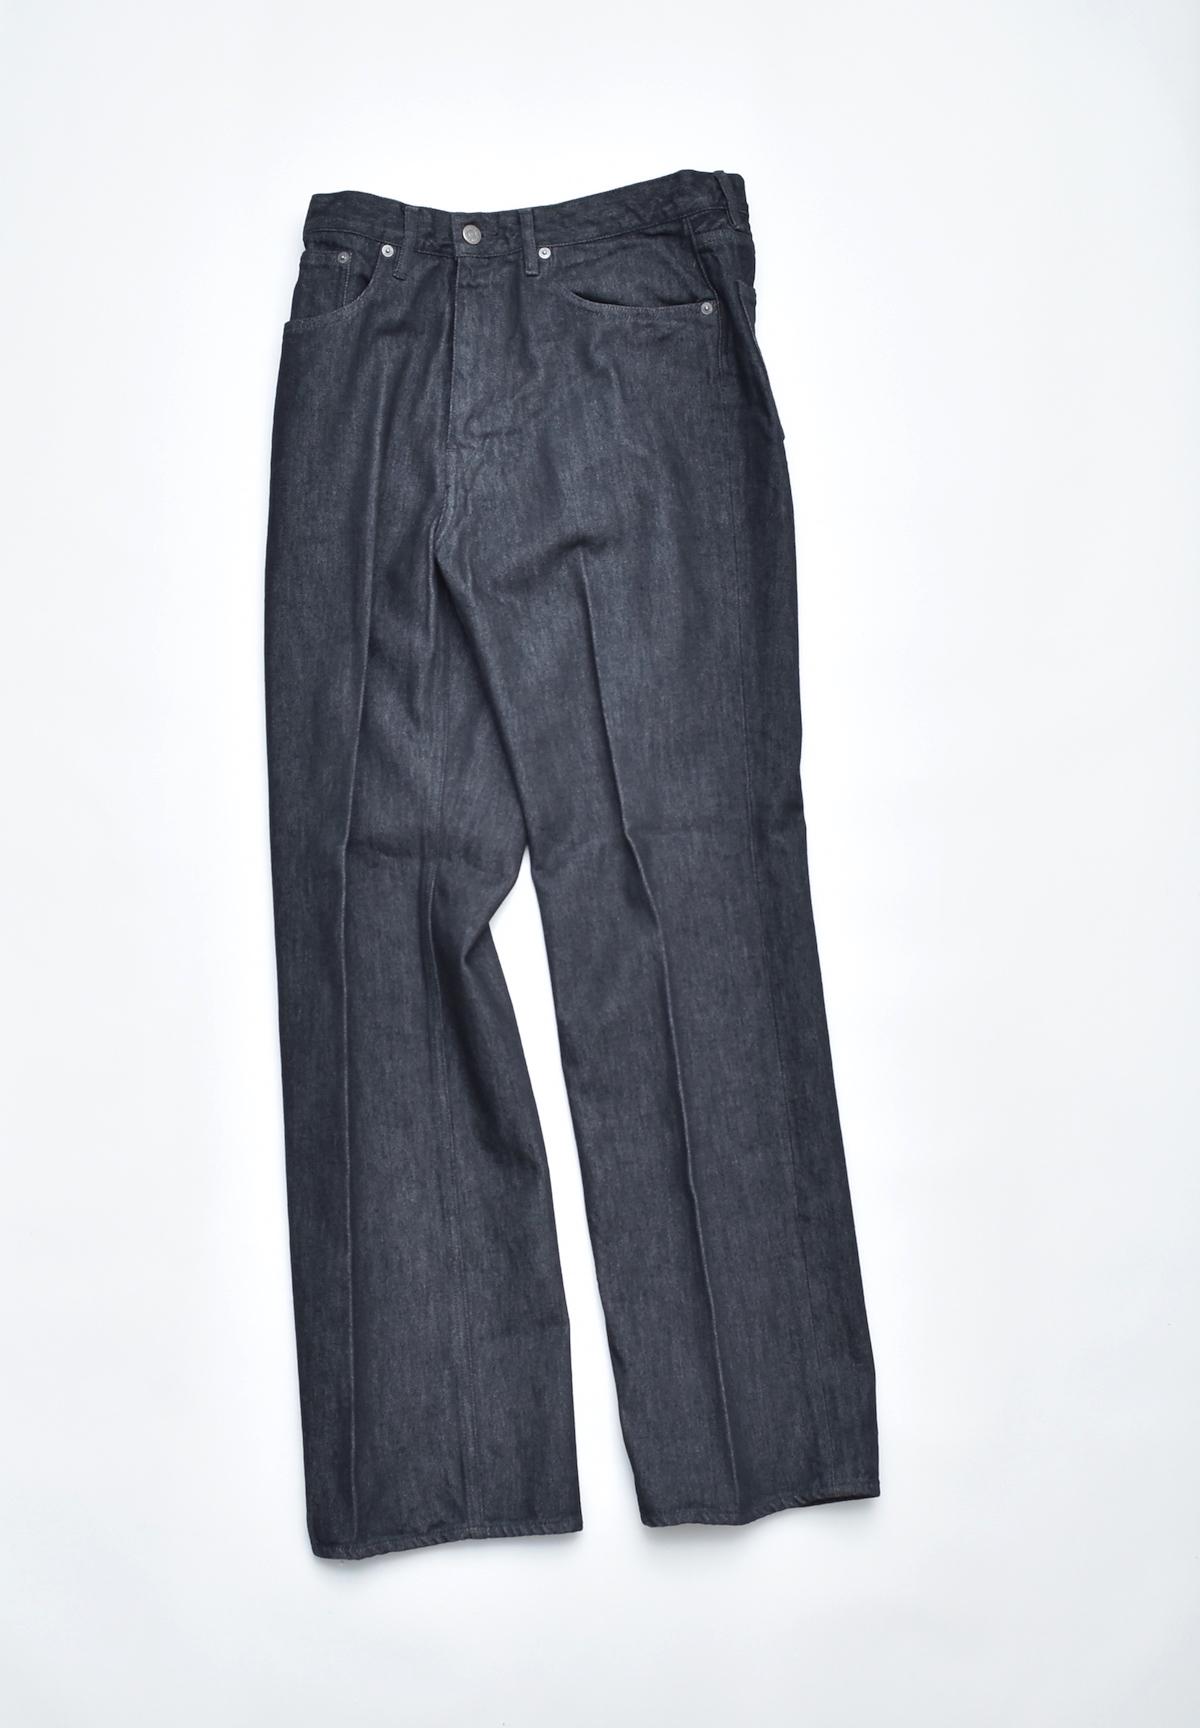 AURALEE「 HARD TWIST DENIM 5P PANTS / BLACK 」